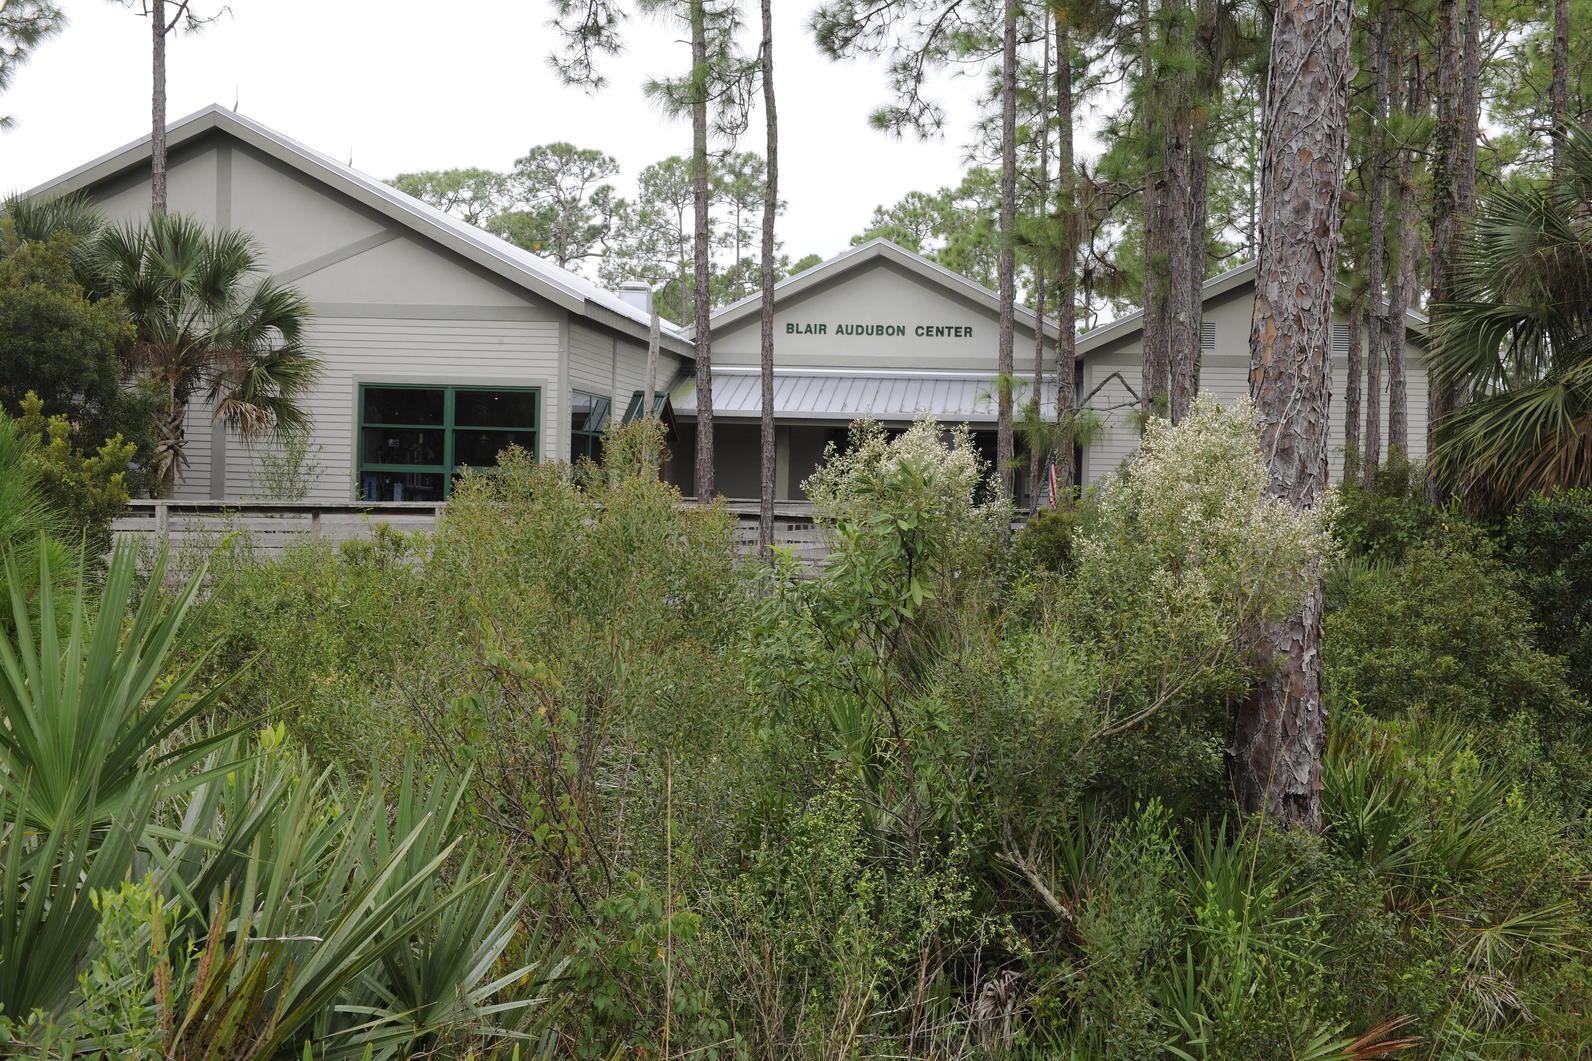 The Blair Center at Corkscrew Swamp Sanctuary